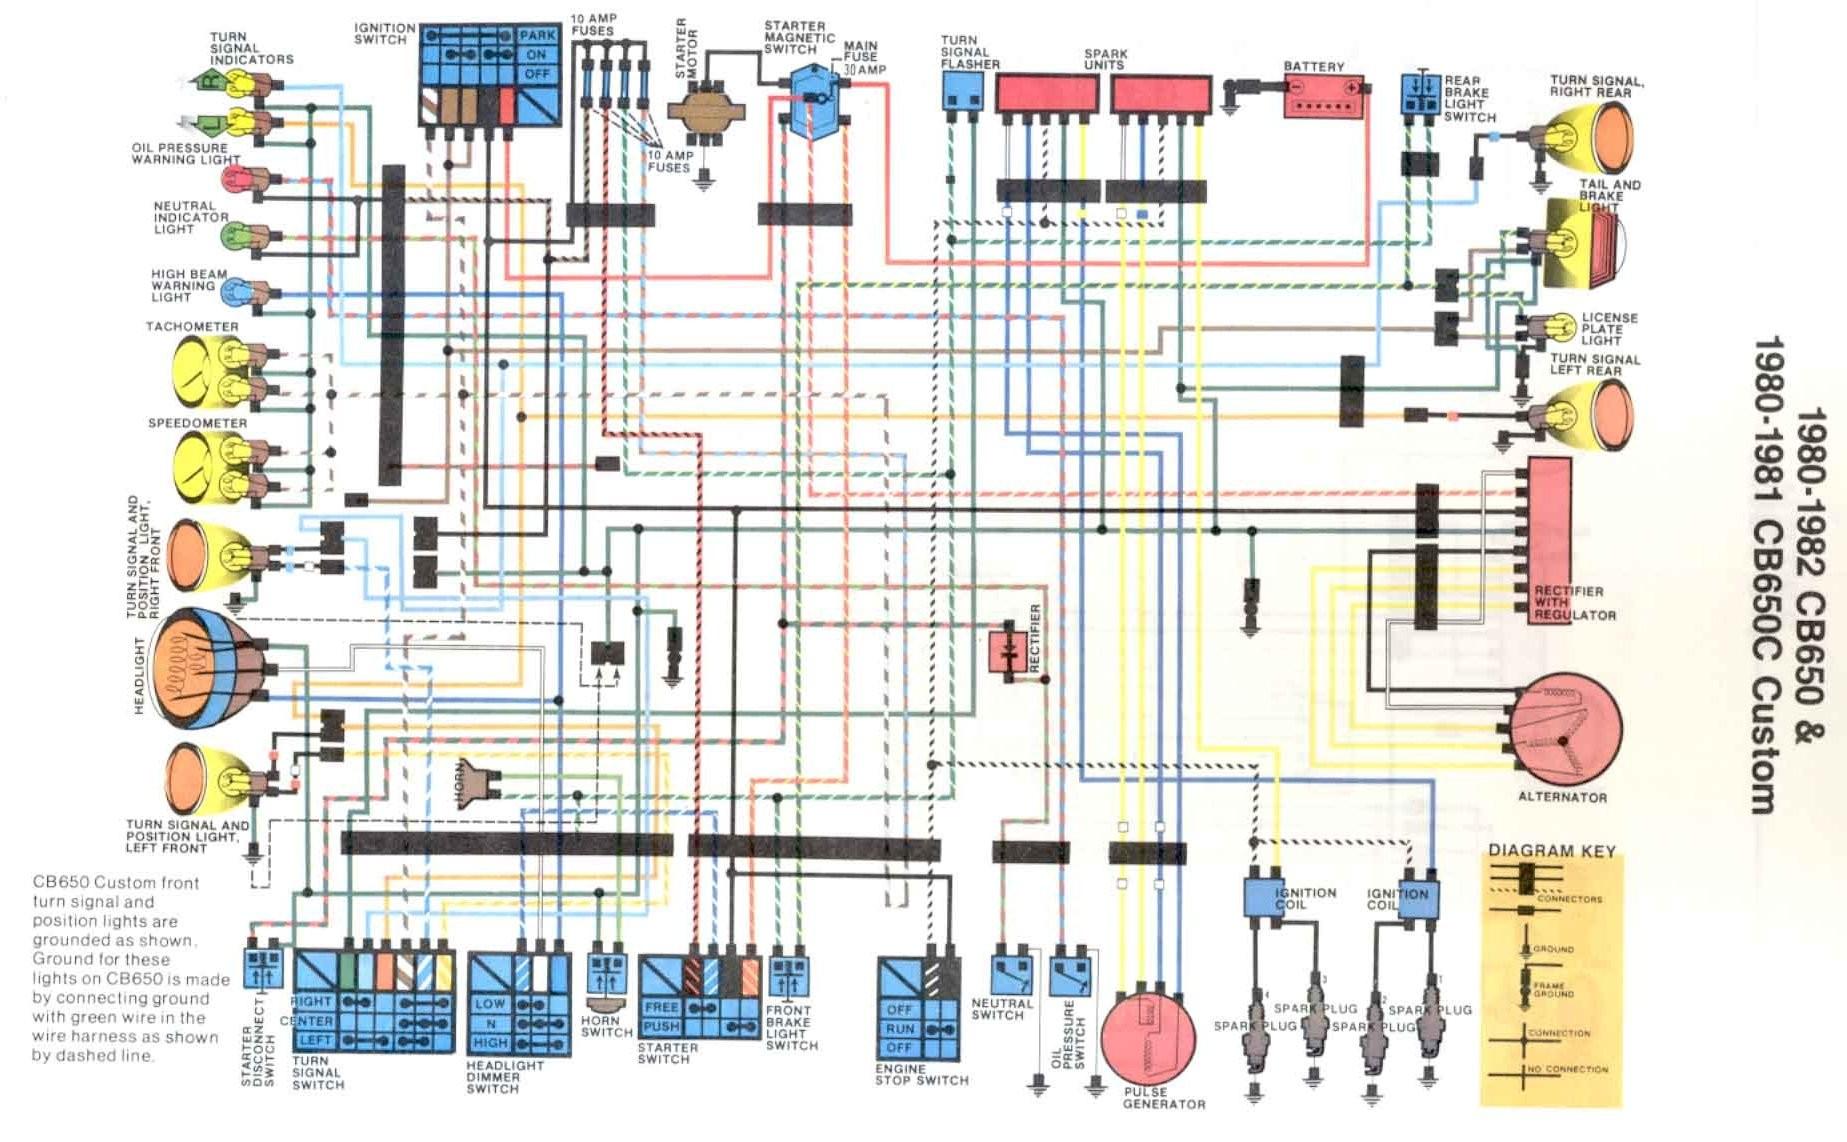 Cb400 Wiring Diagram Cb650c Wiring Diagram Wiring Schematic Diagram Of Cb400 Wiring Diagram